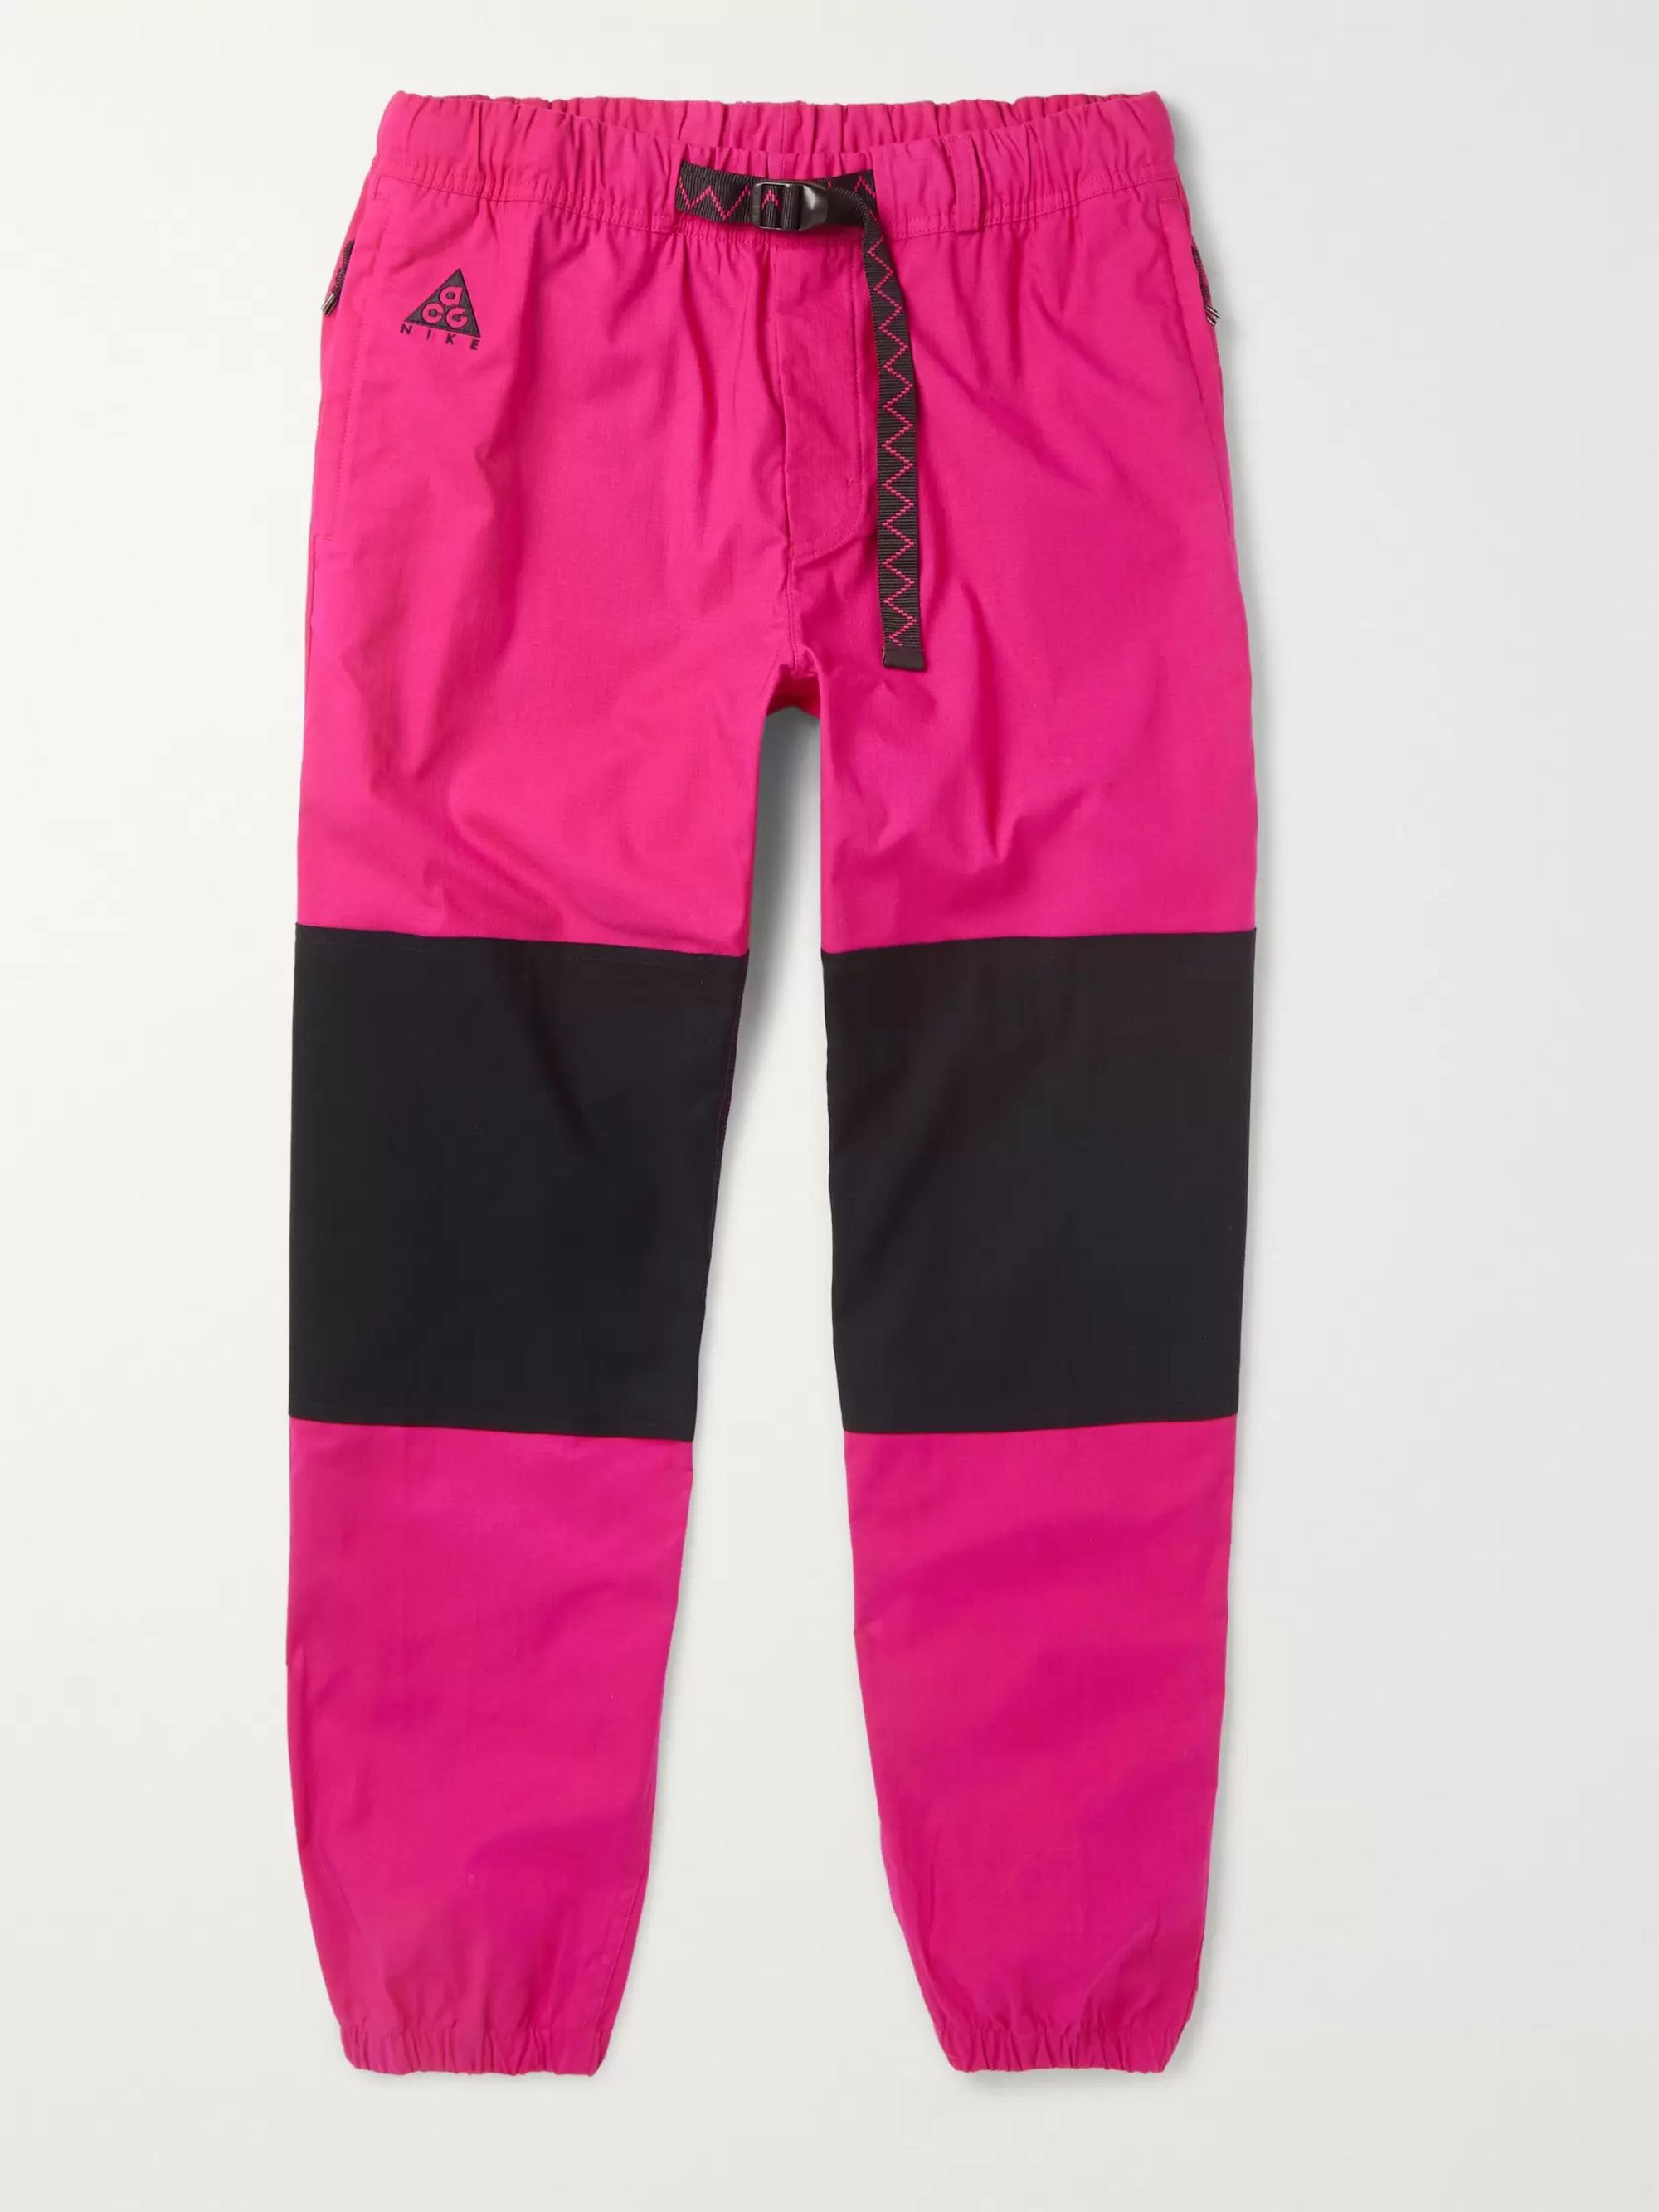 nike pants pink